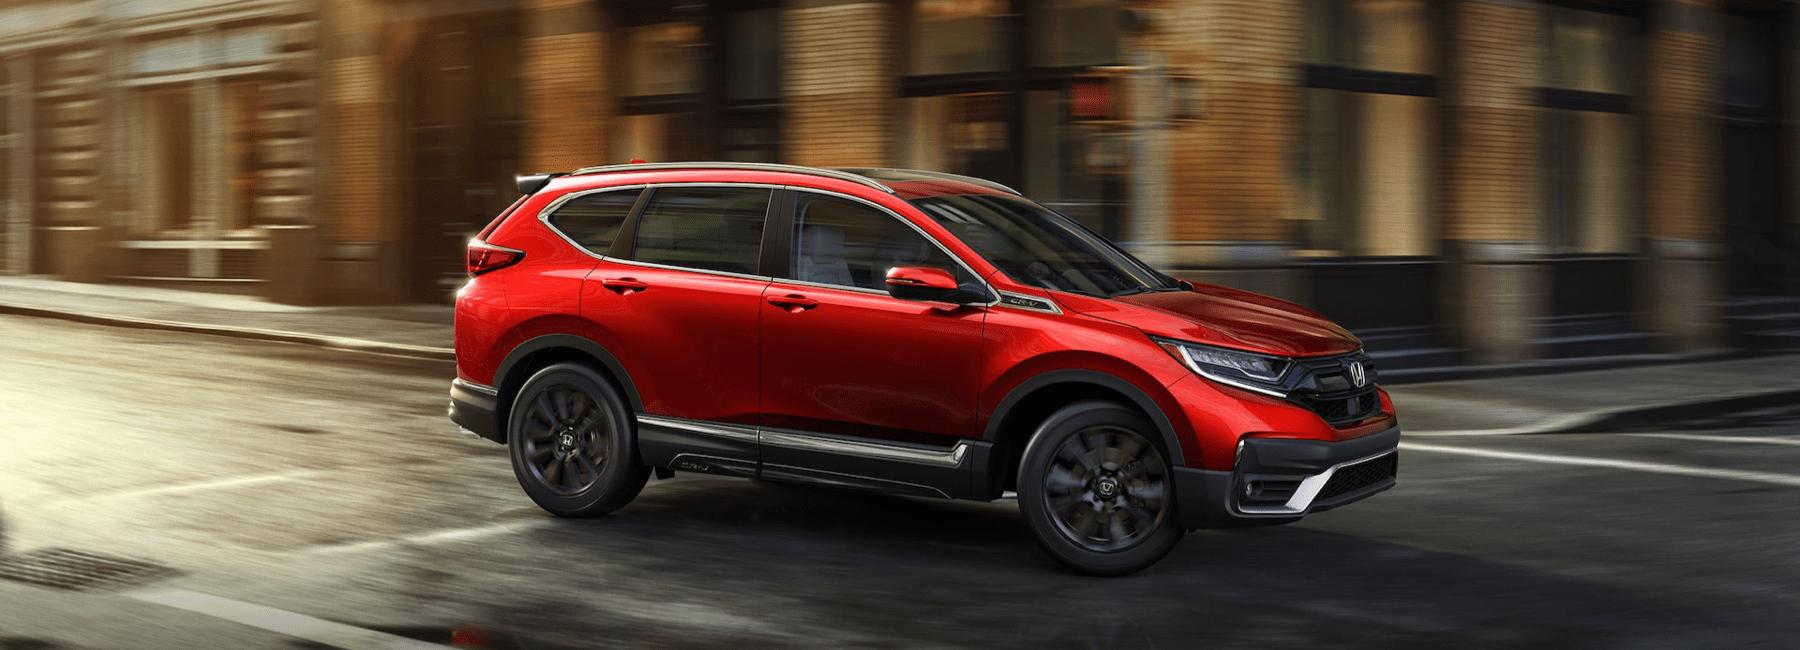 2020 Honda CRV turns city corner